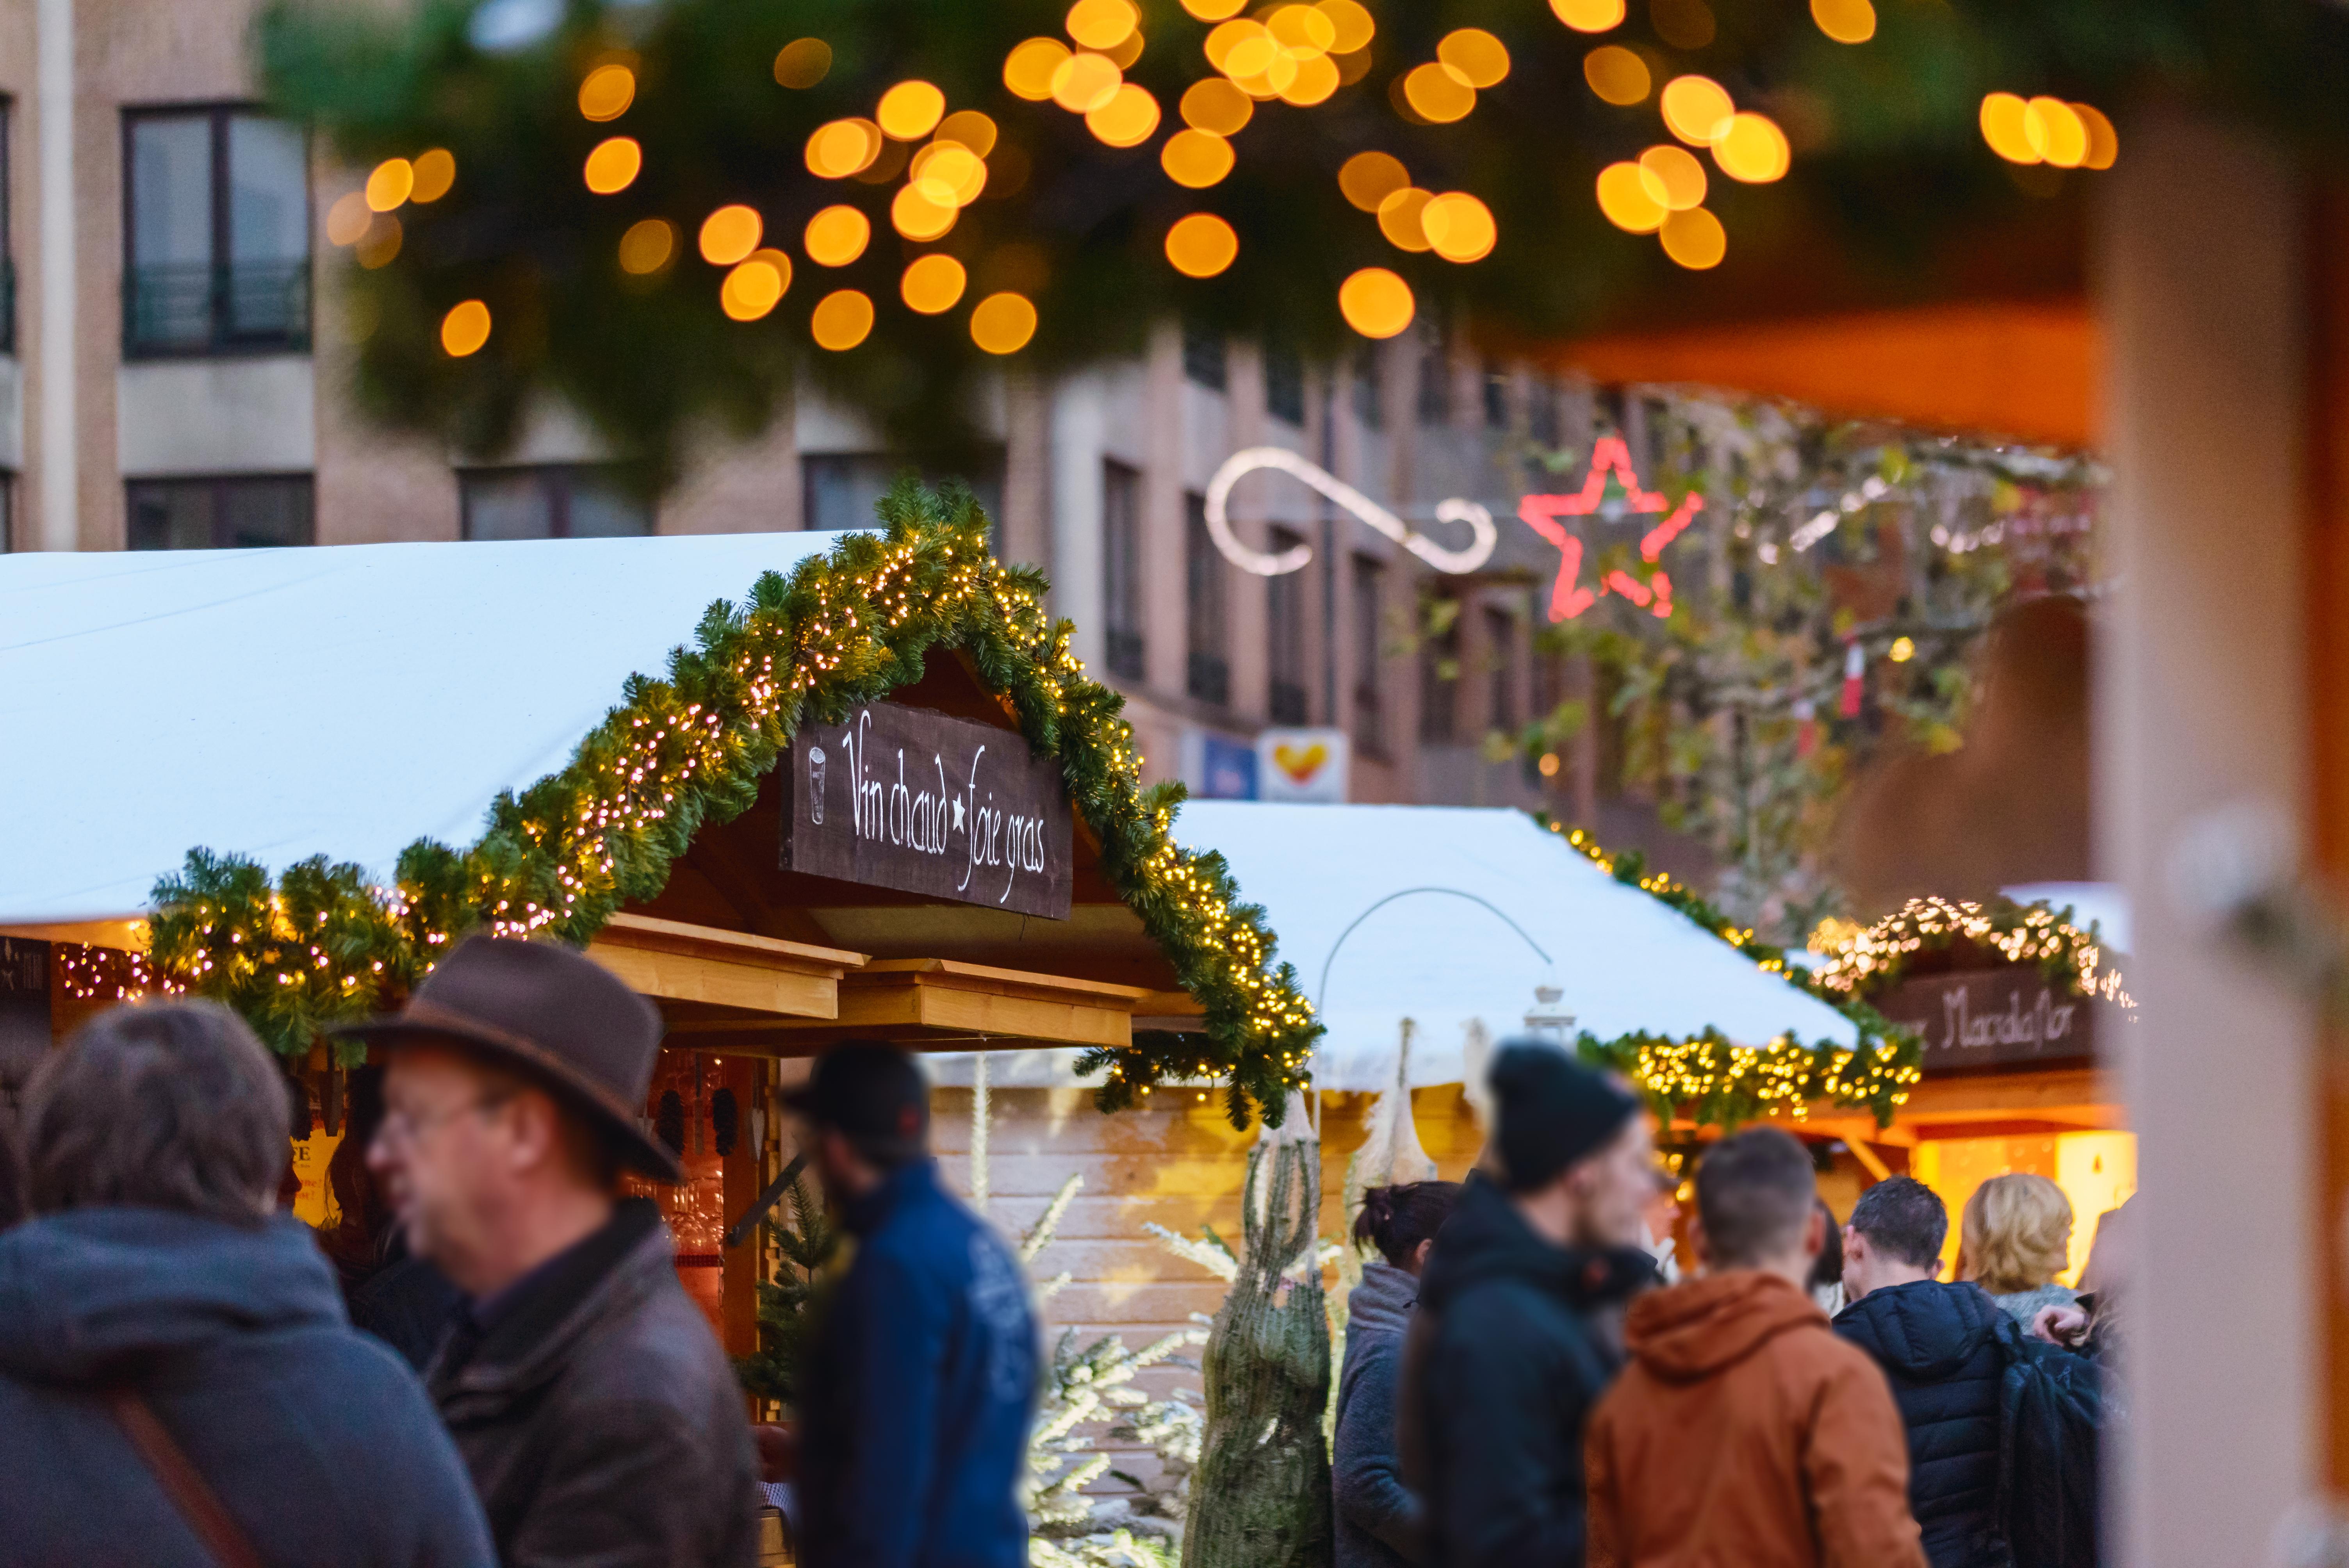 Enjoy a mulled wine at Louvain-la-Neuve's Christmas market